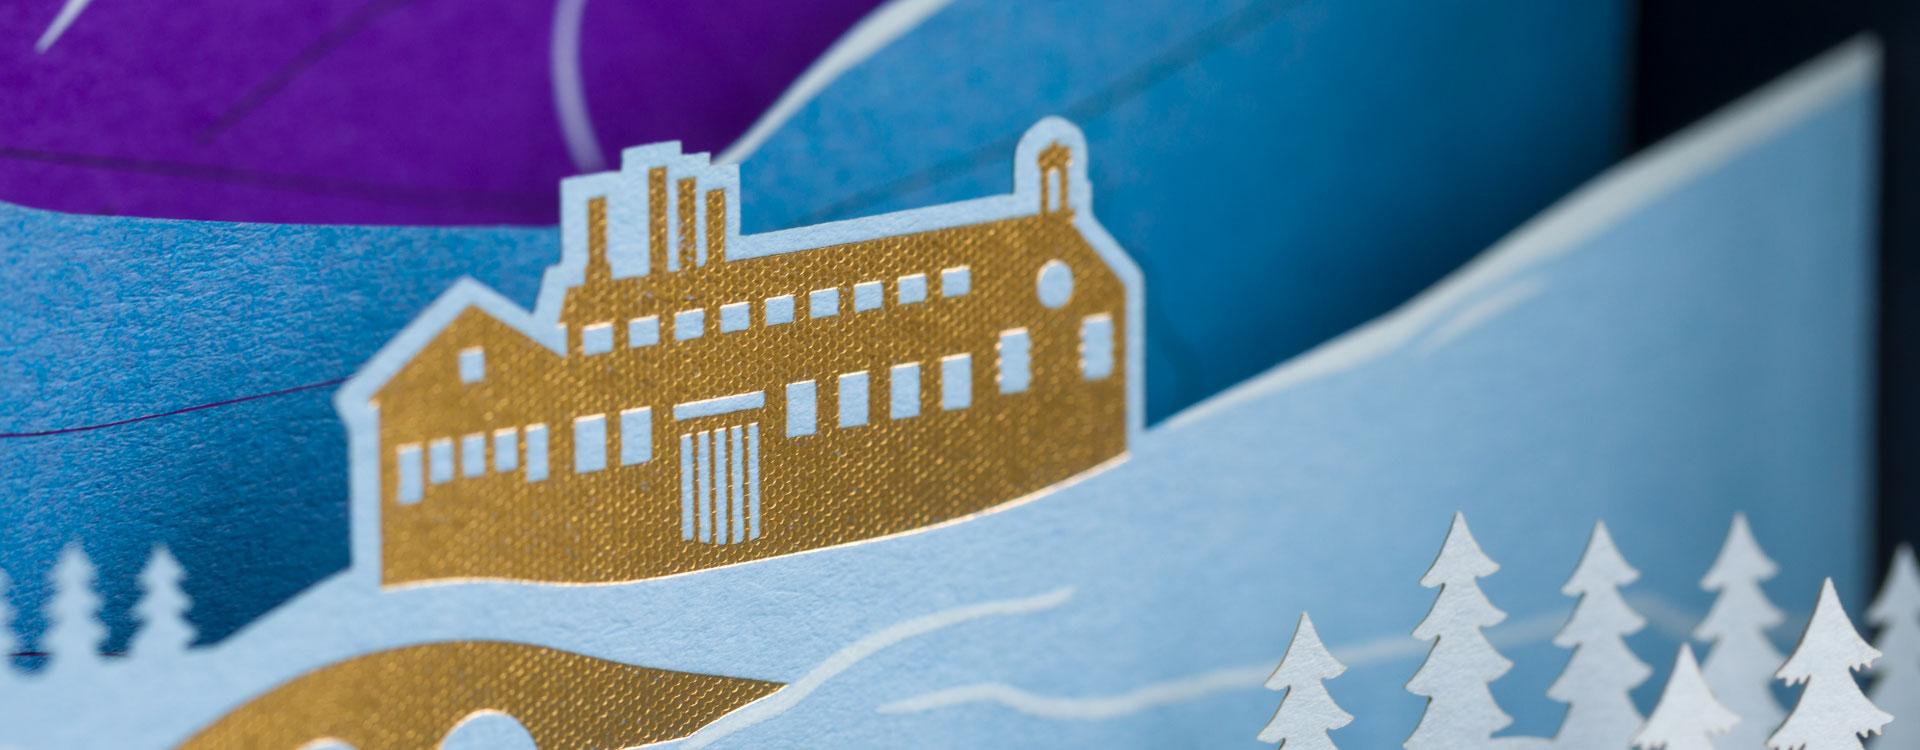 Plain Creative Project - James Cropper Christmas Cards - 1